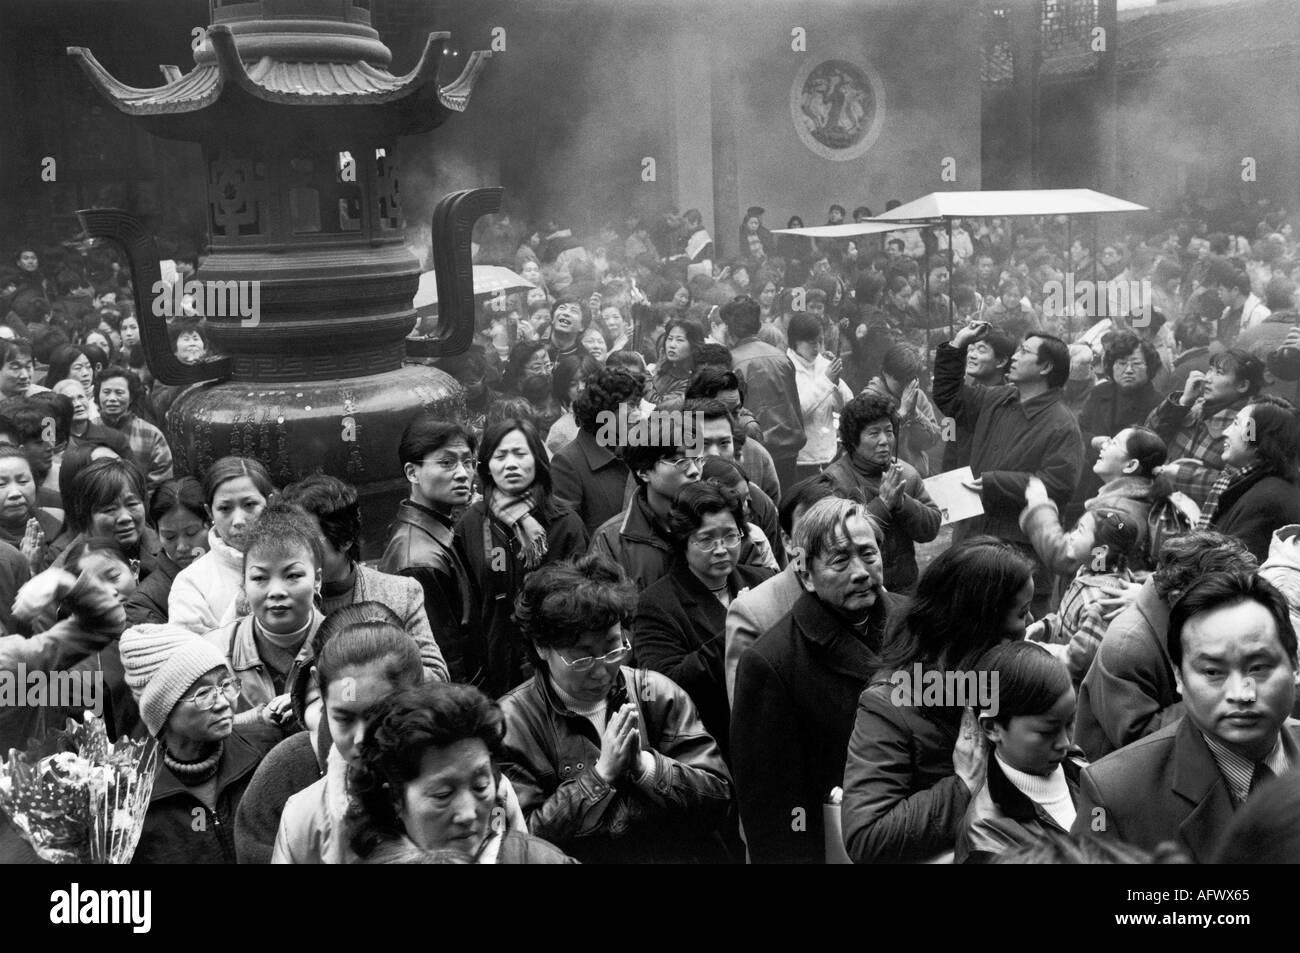 Jade Buddha Temple  Shanghai China.  Chinese people praying Buddhists saying prayers 2000s. HOMER SYKES Stock Photo